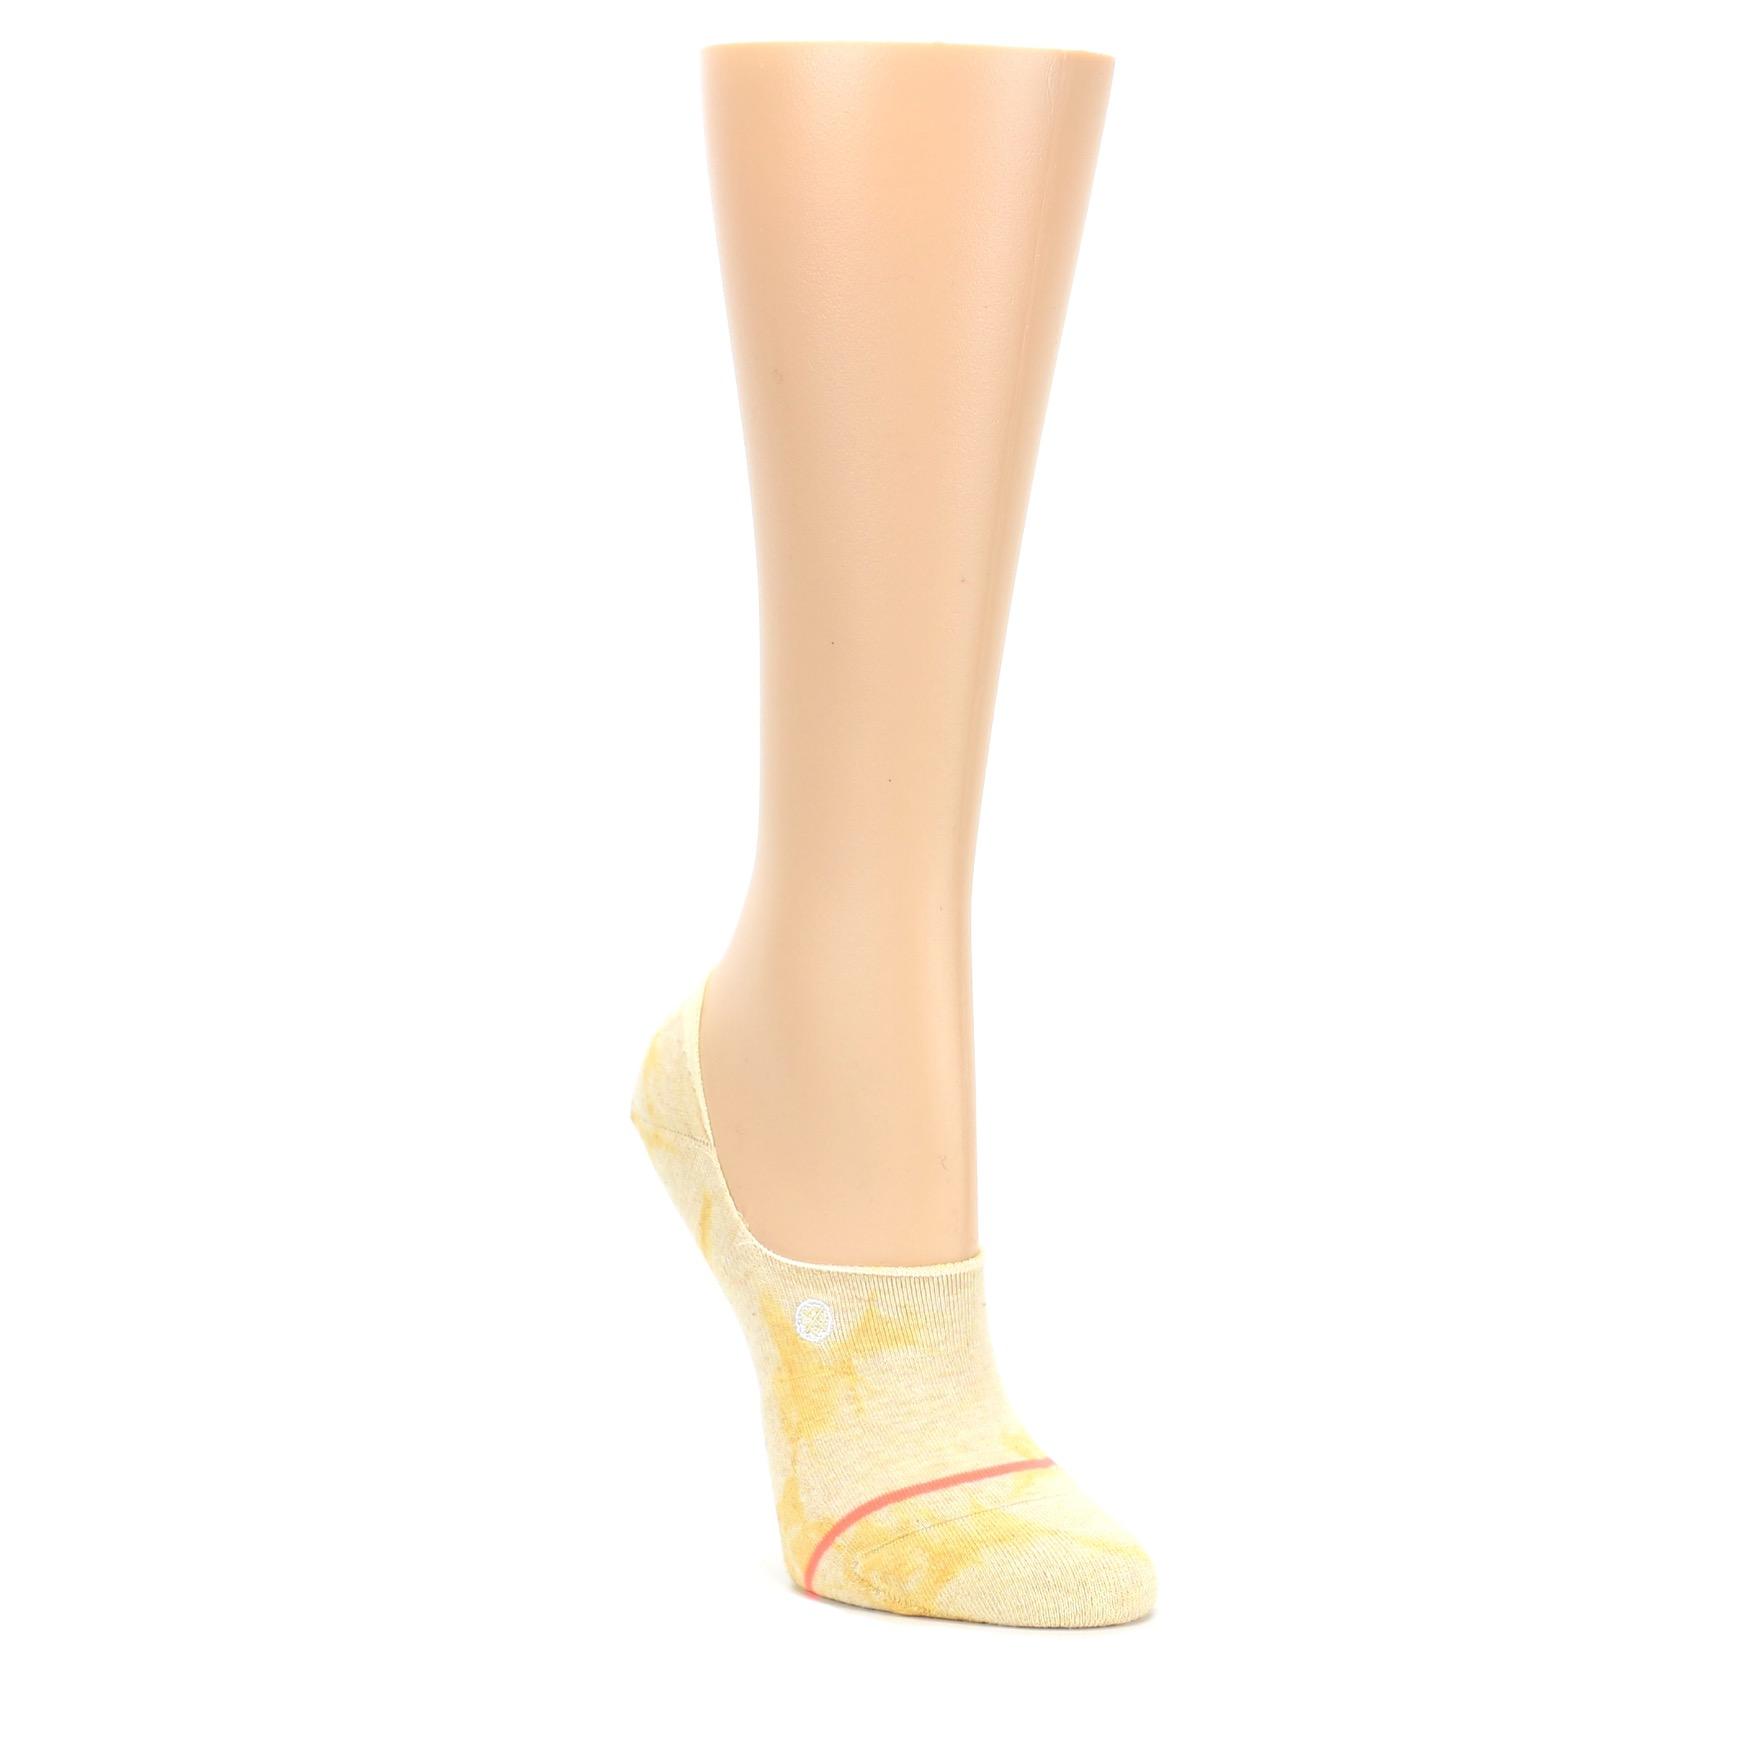 801fdeb5940 Yellow Tie Dye Women's No Show Liner Socks | boldSOCKS